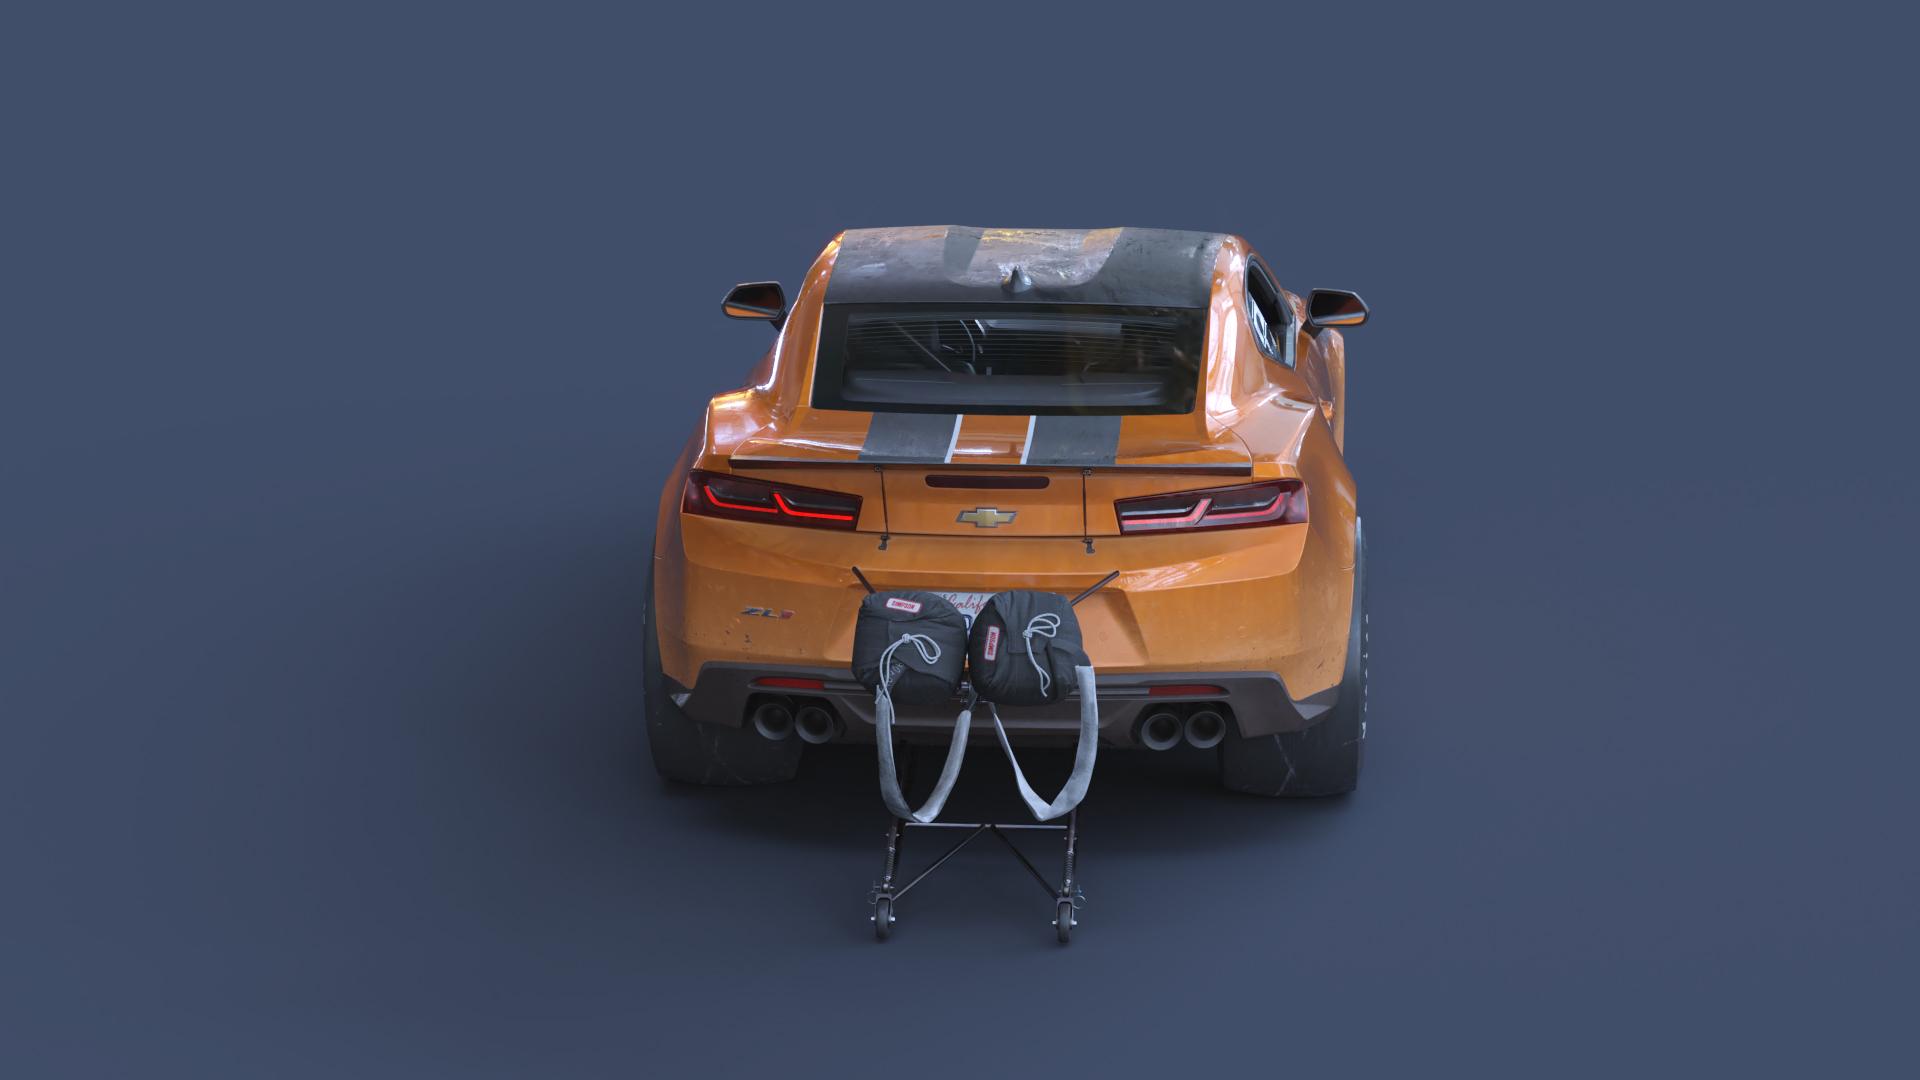 Drag racing Camaro - Car Render Challenge 2019